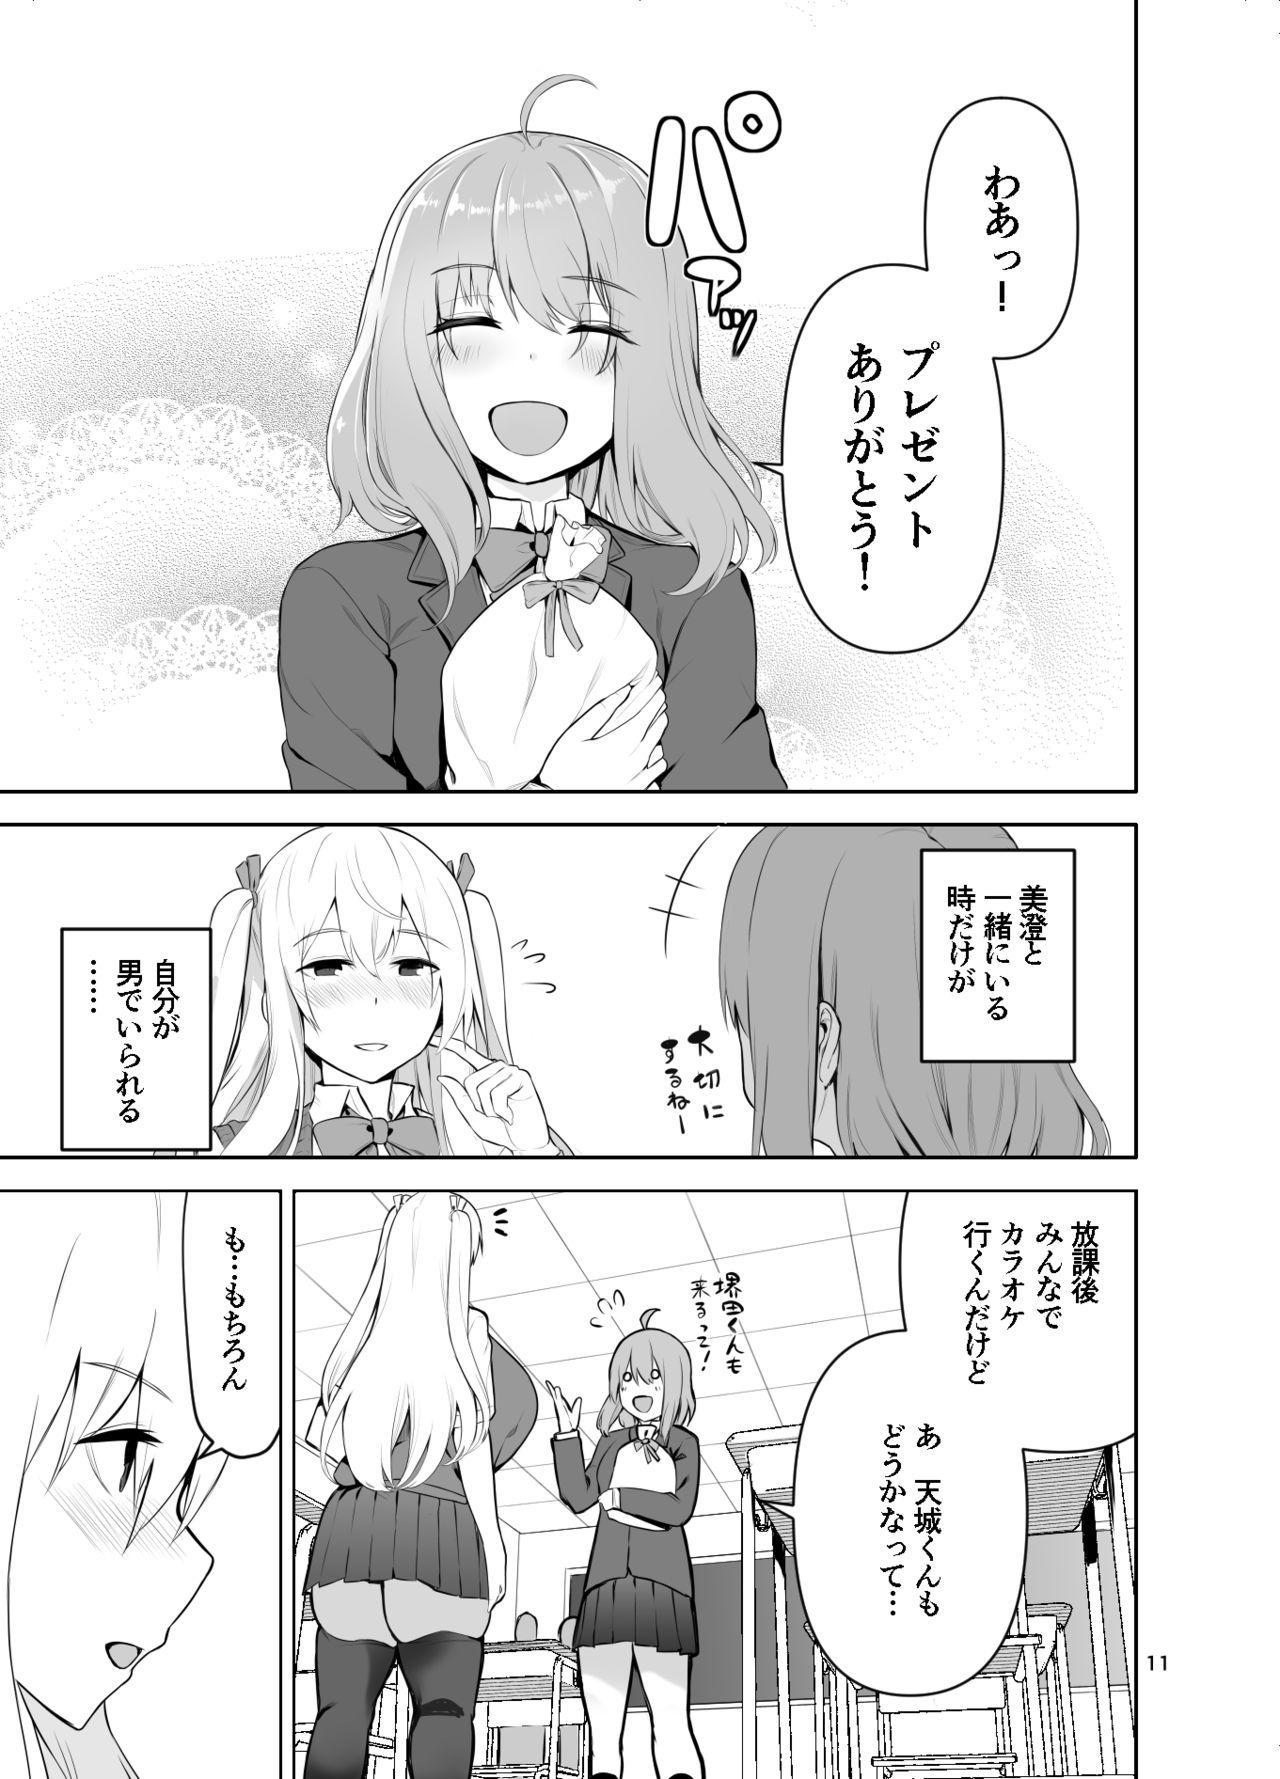 [Wakuseiburo (cup-chan)] TS Musume Kodama-chan to H! Sono 4 | TS Girl Kodama-chan and Ecchi! Part 4 [Digital] 11